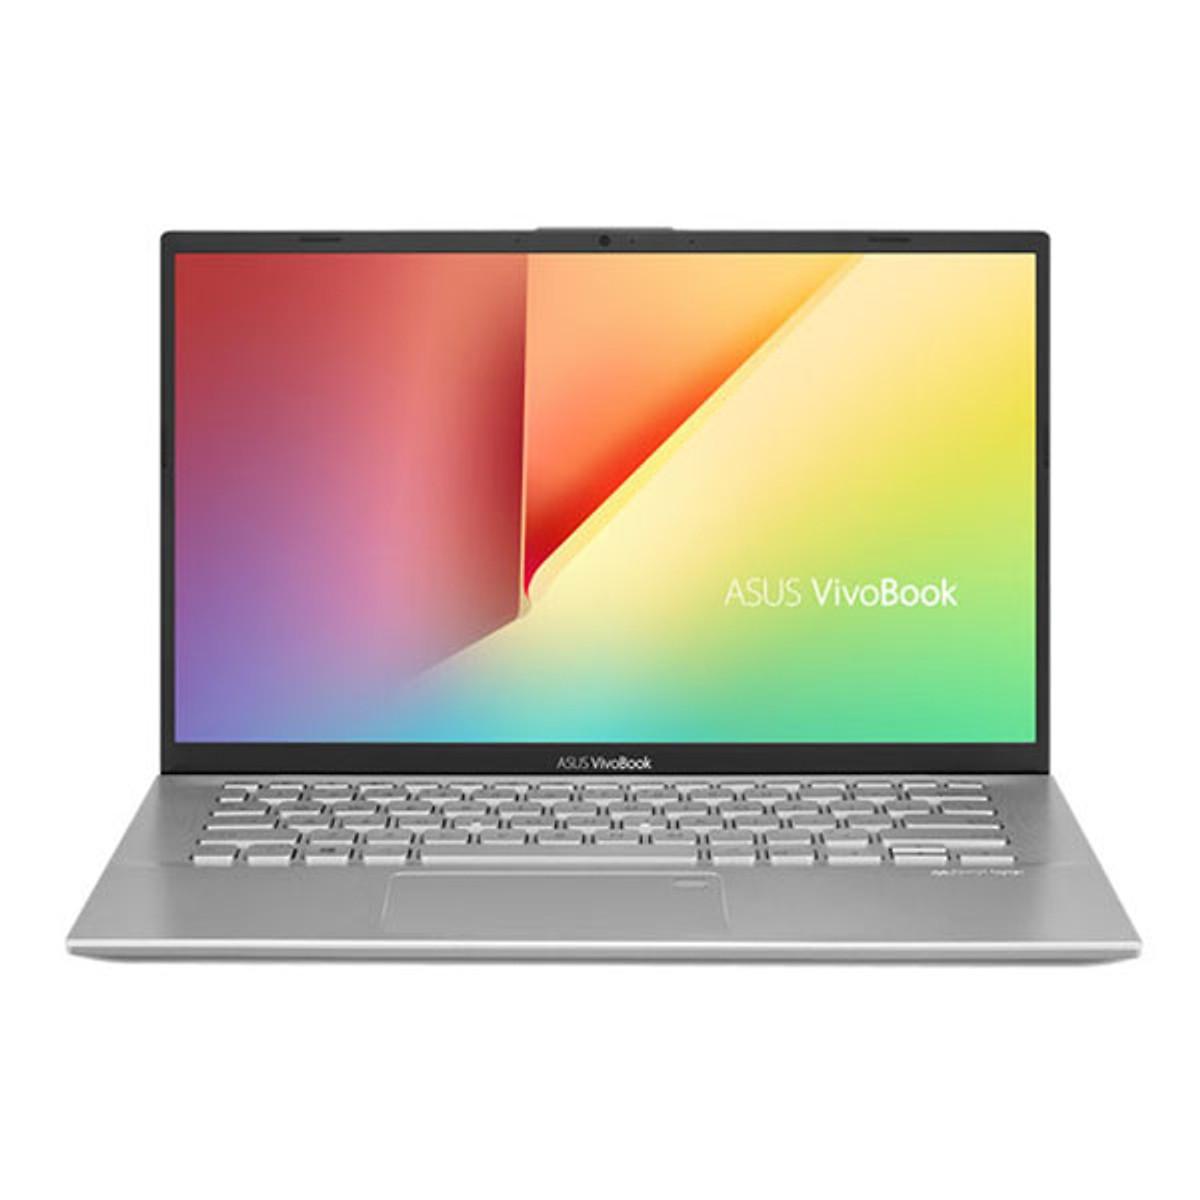 ASUS VivoBook X409F (1)